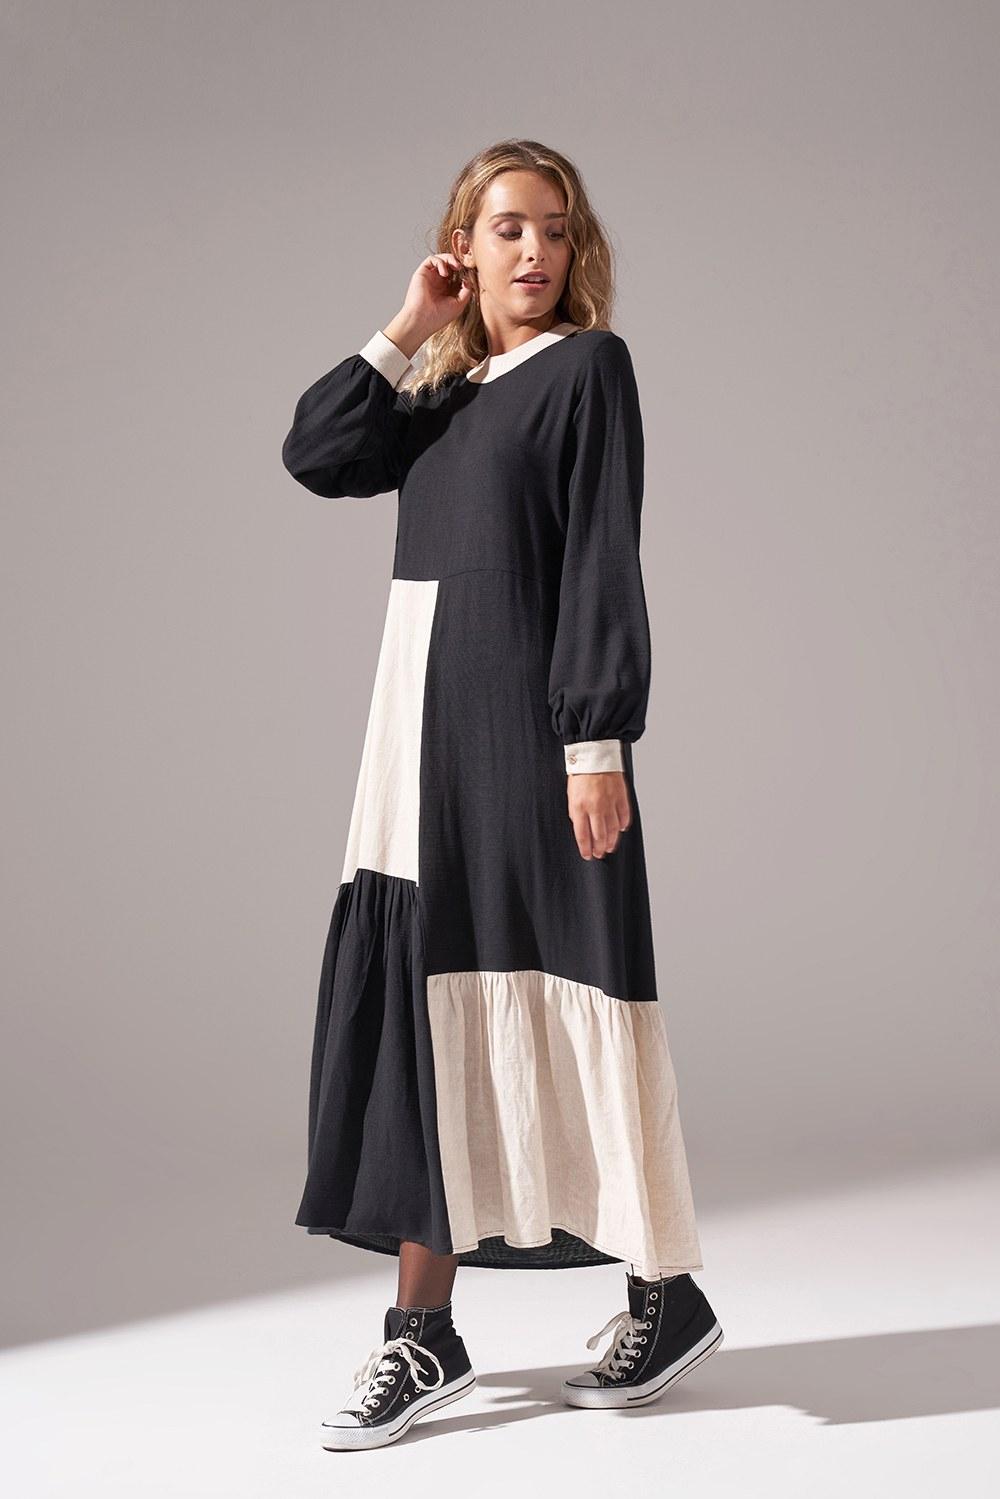 Kare Parçalı Elbise (Siyah)